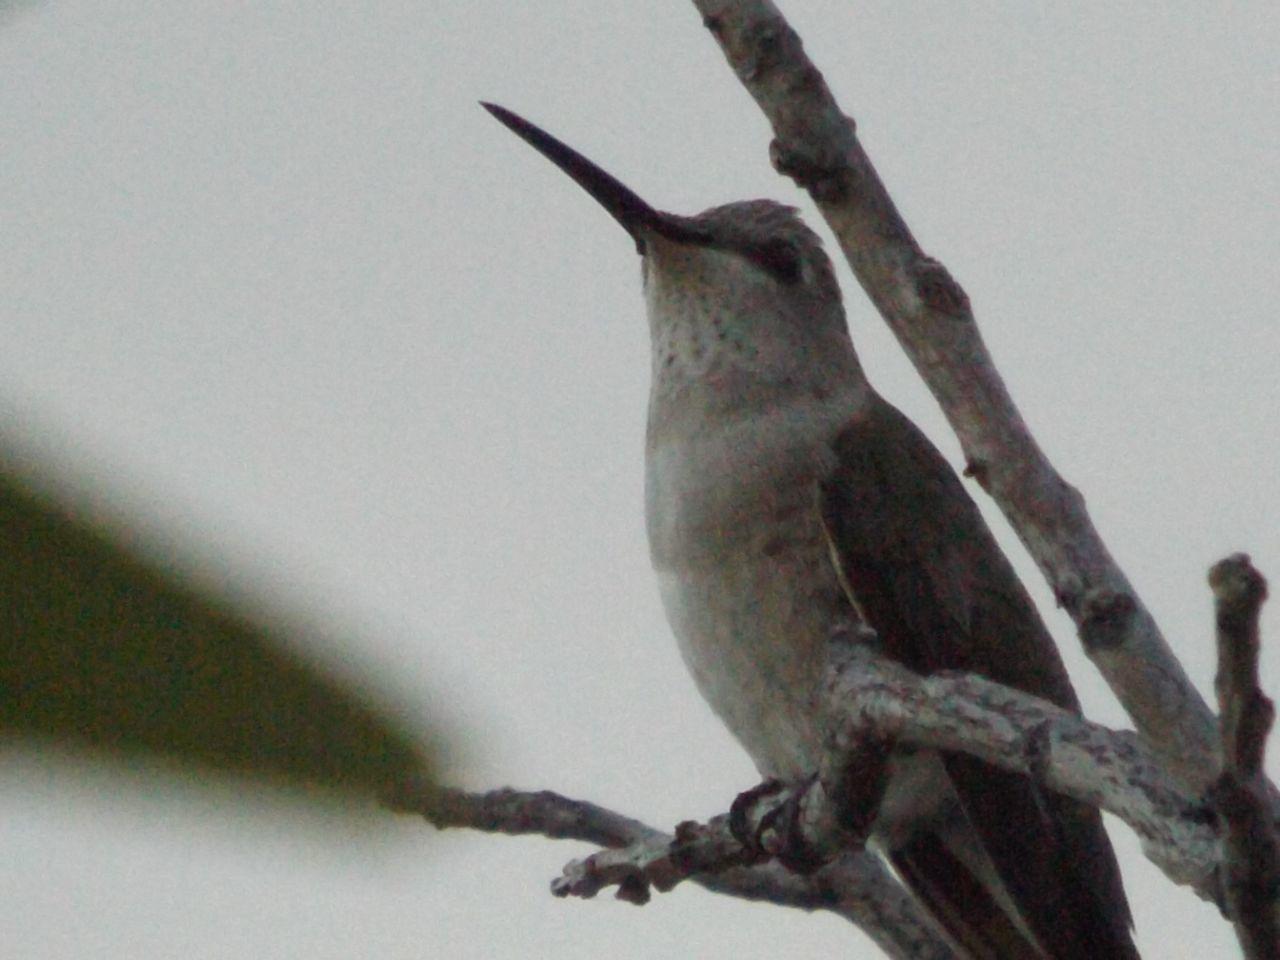 The Purist (no Edit, No Filter) Hummingbird